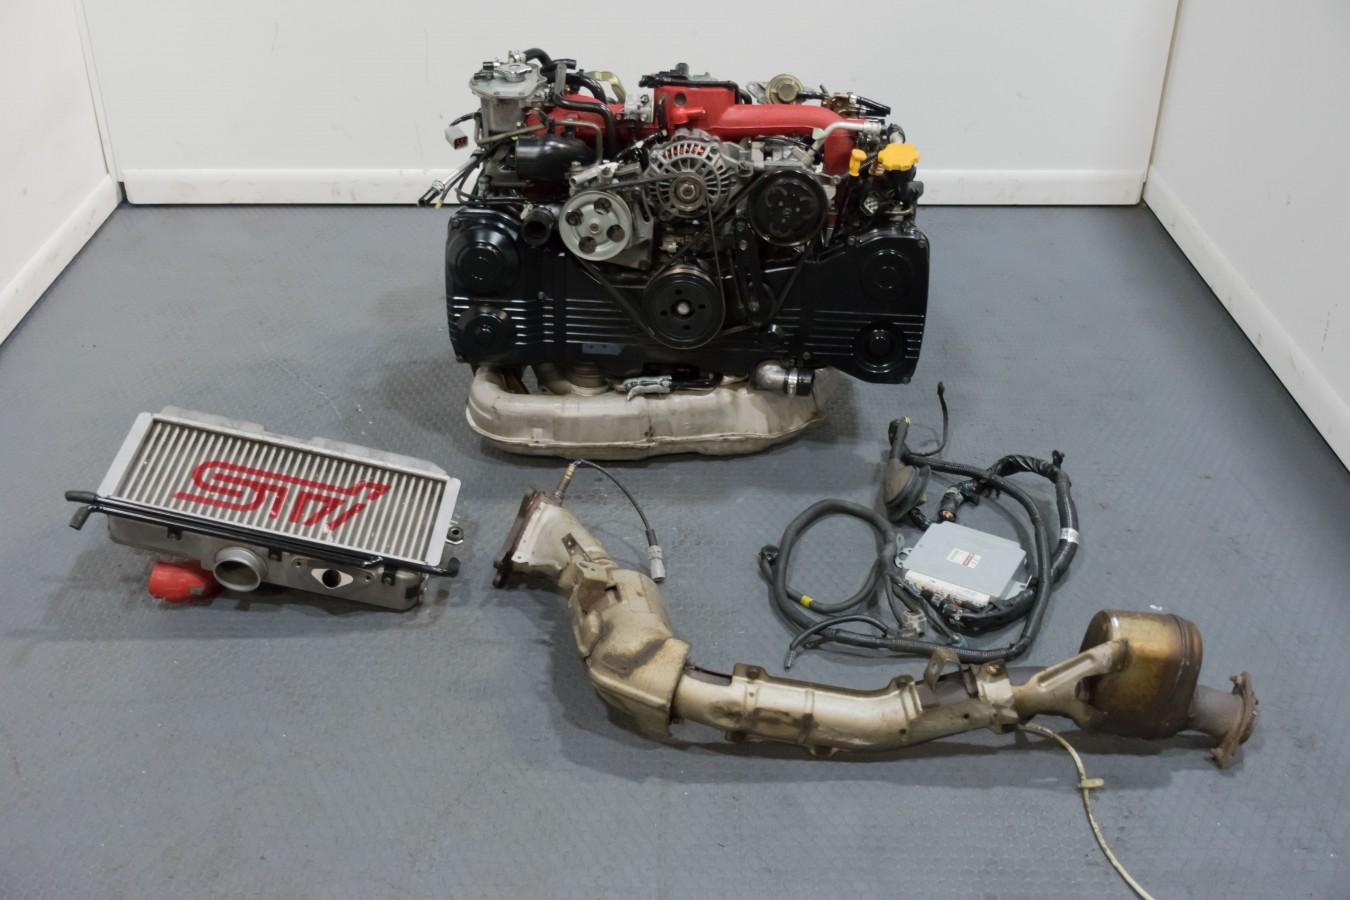 Version 9 EJ207 JDM WRX STi Engine Package with VF37 Twin Scroll Turbo on